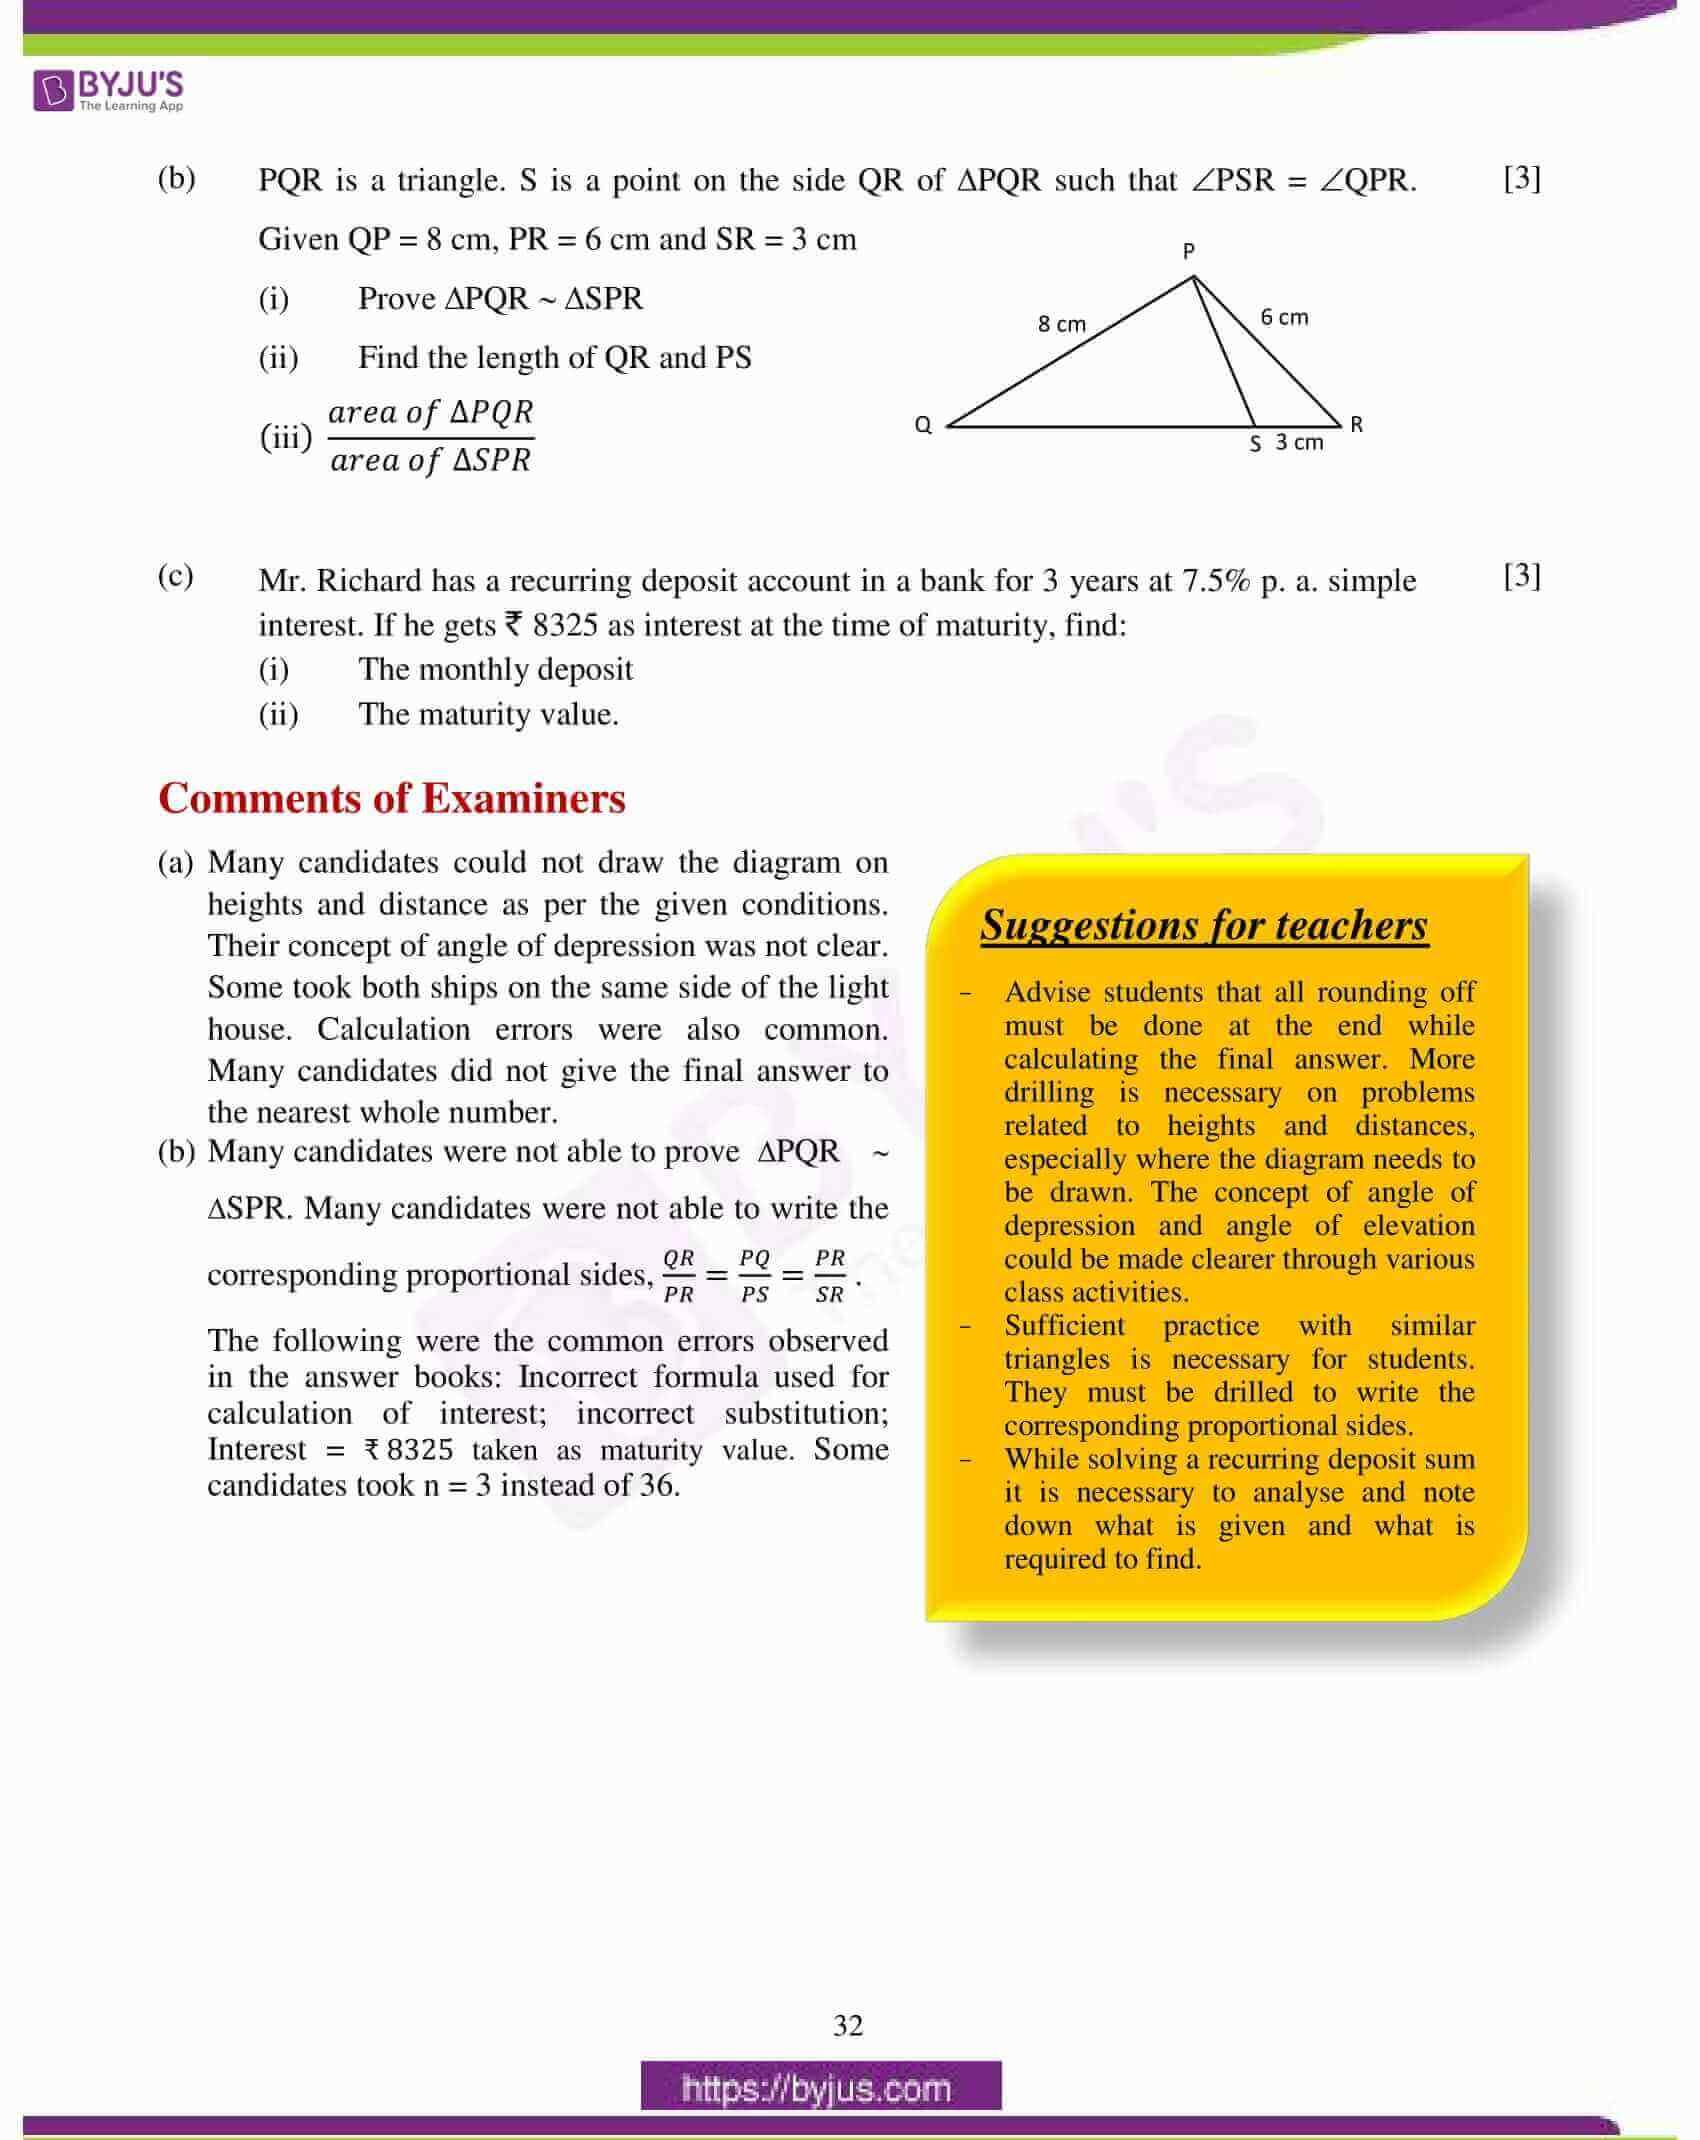 icse class 10 maths question paper solution 2017 23